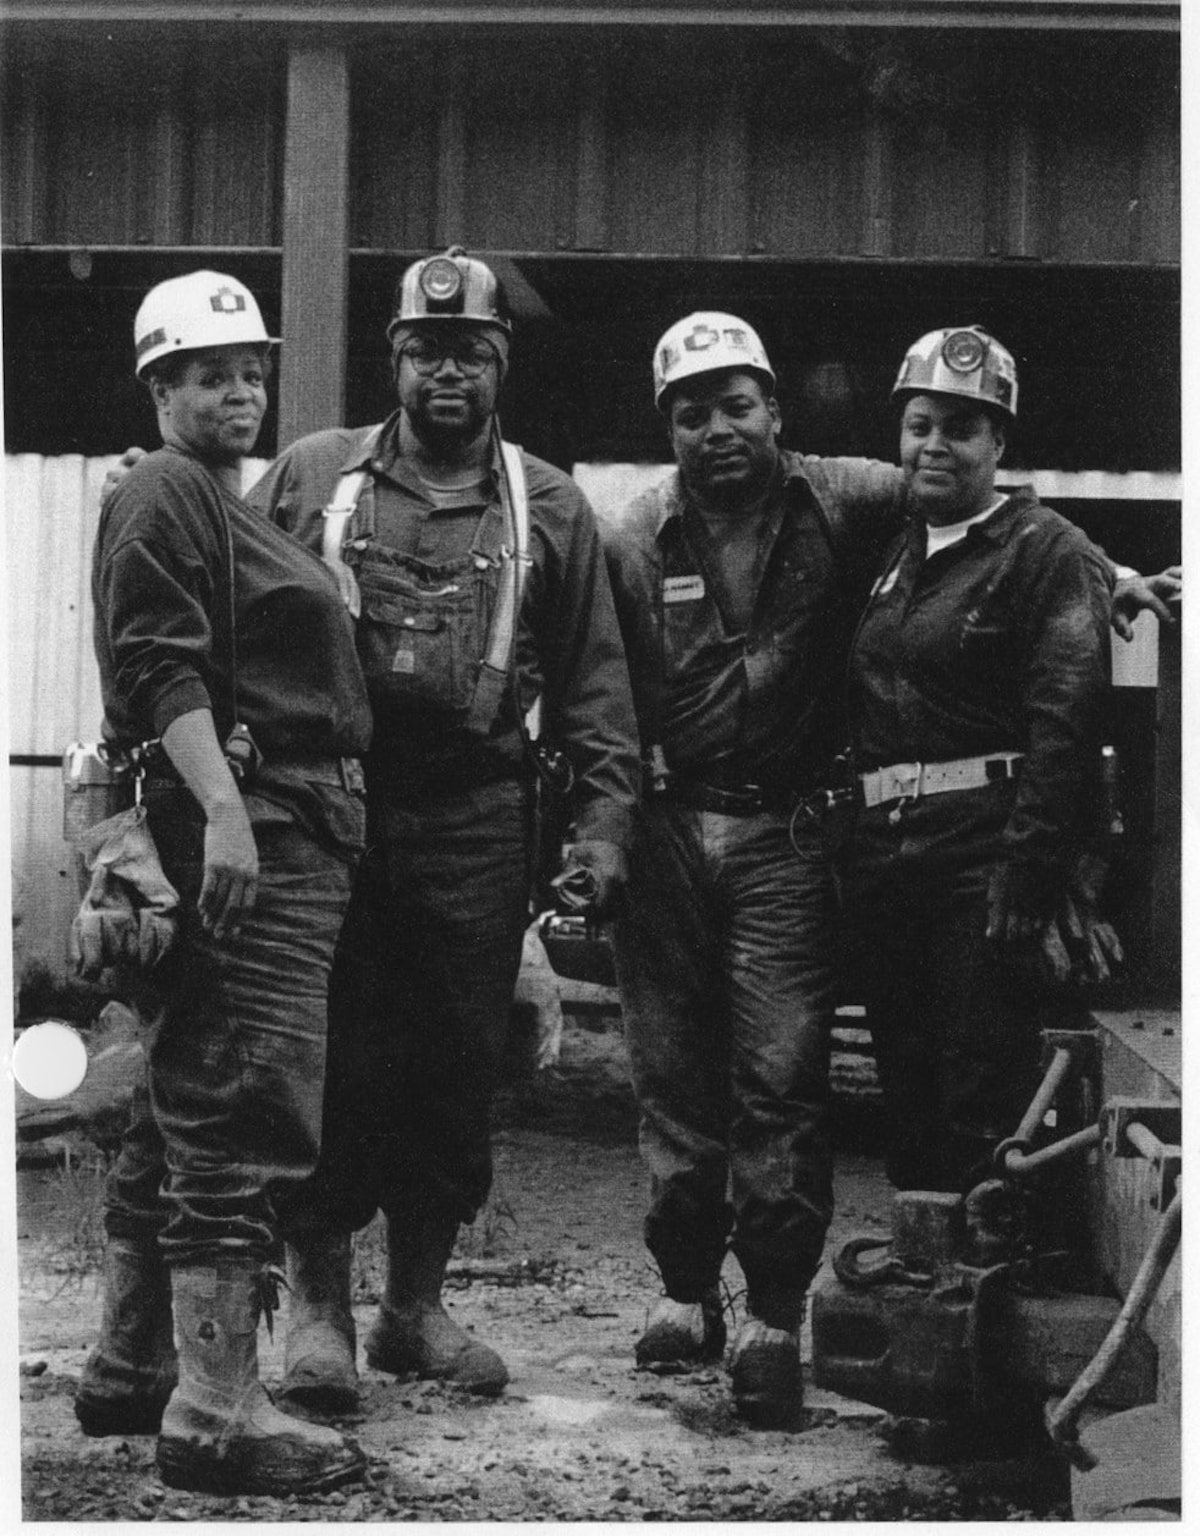 African American Coal Miners, African American Appalachian, African American Worker, KOLUMN Magazine, KOLUMN